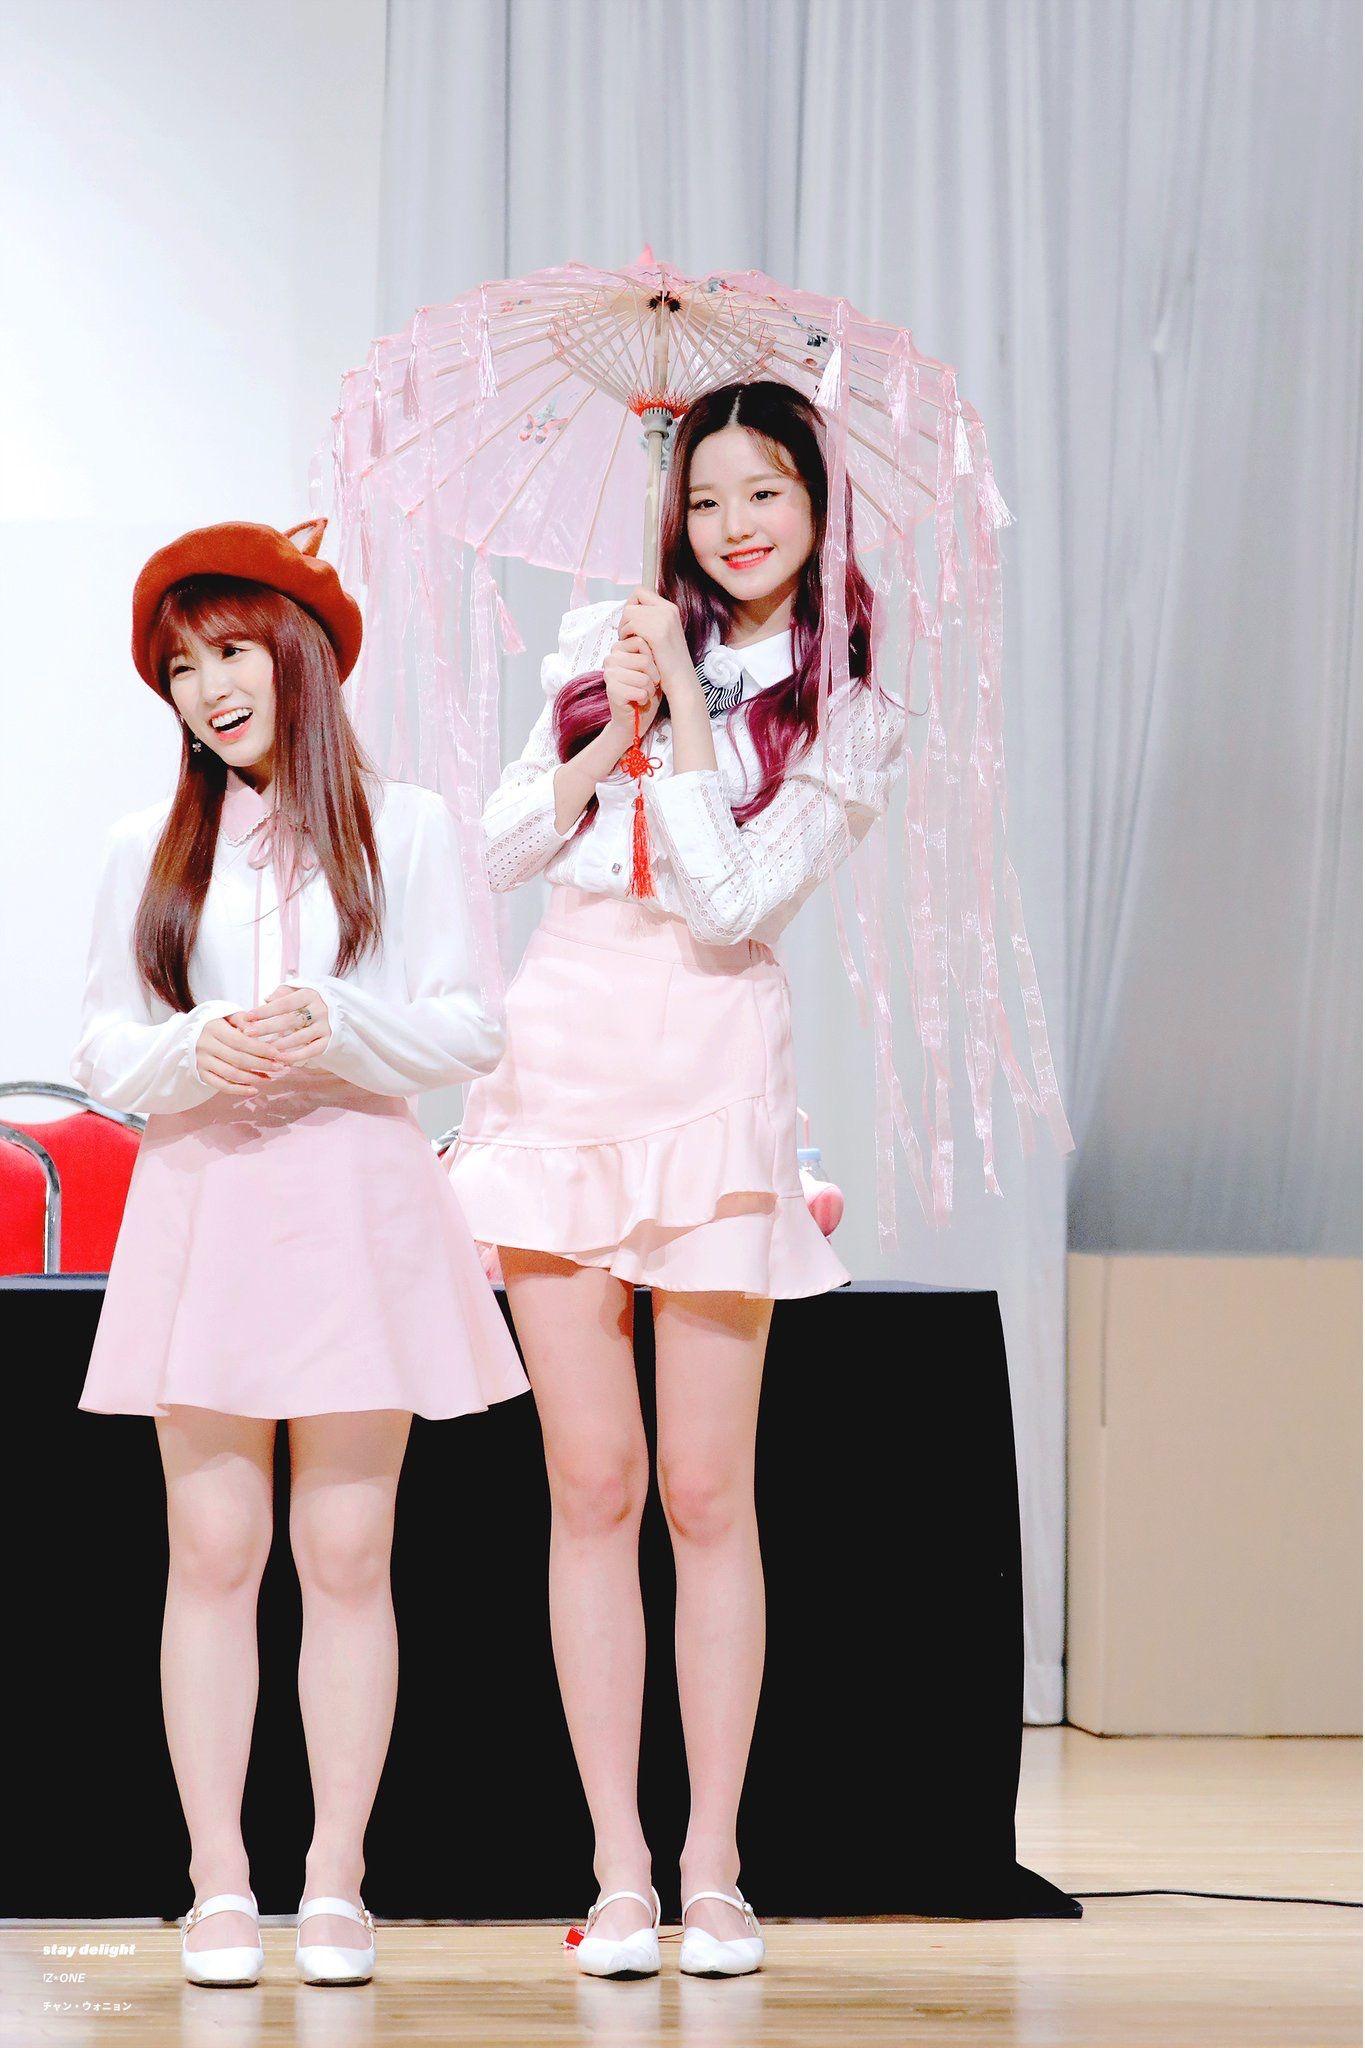 IZ*ONE Nako and Wonyoung